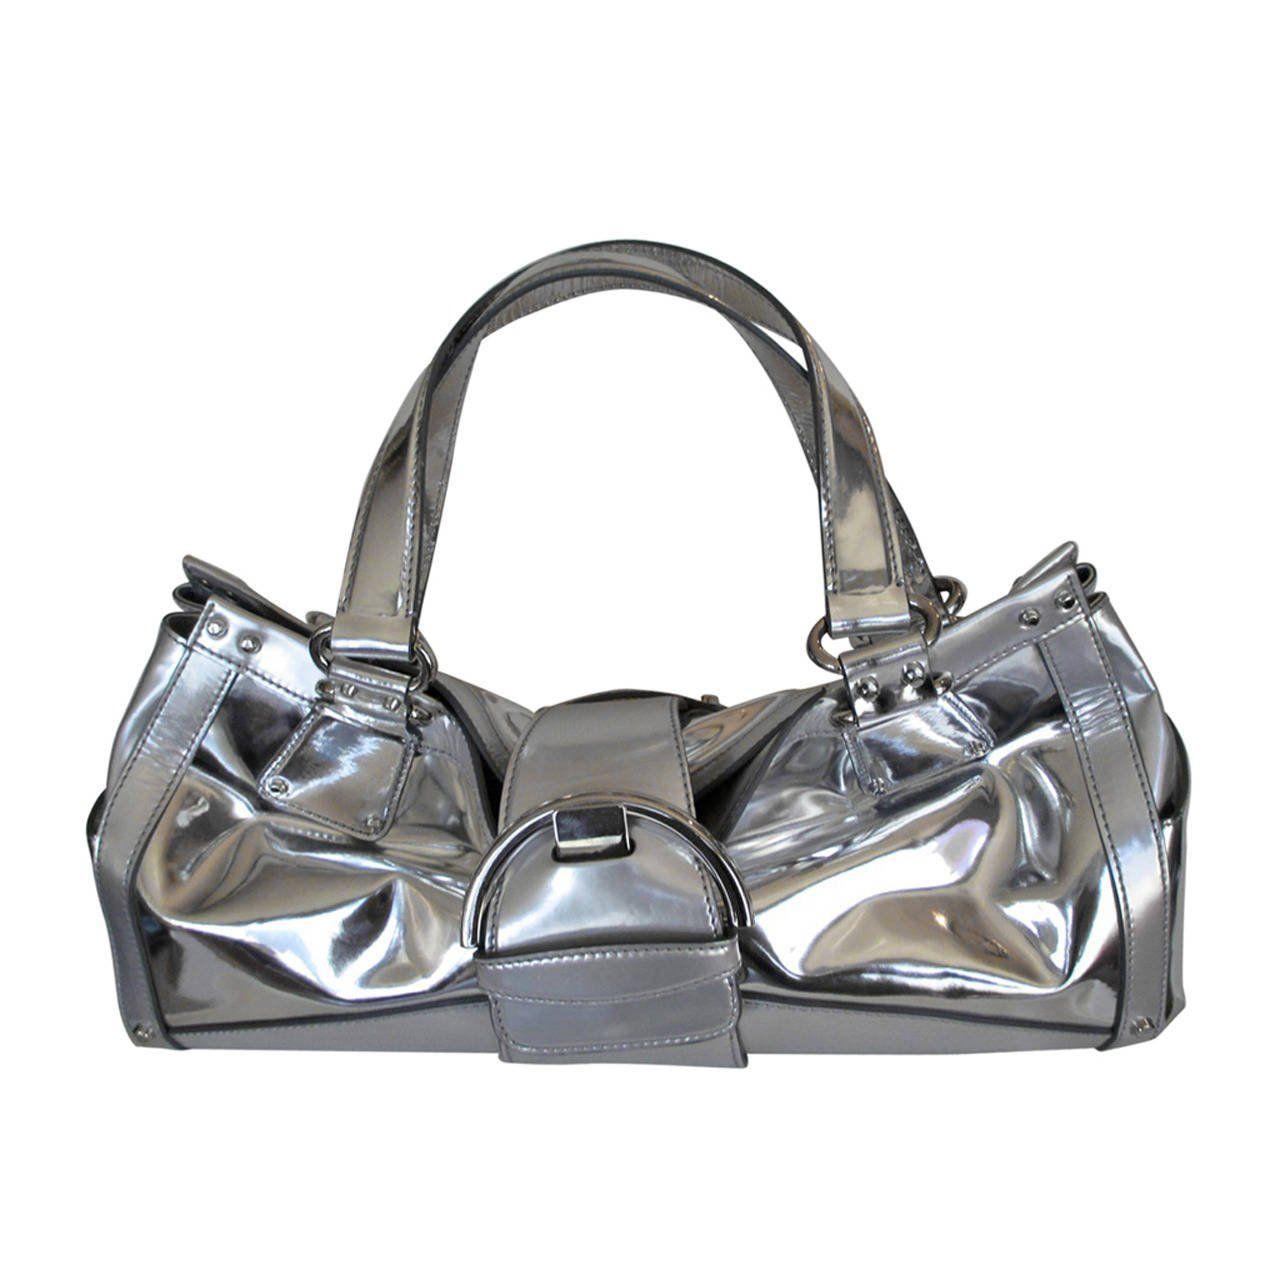 Sergio Rossi silver Leather handbag